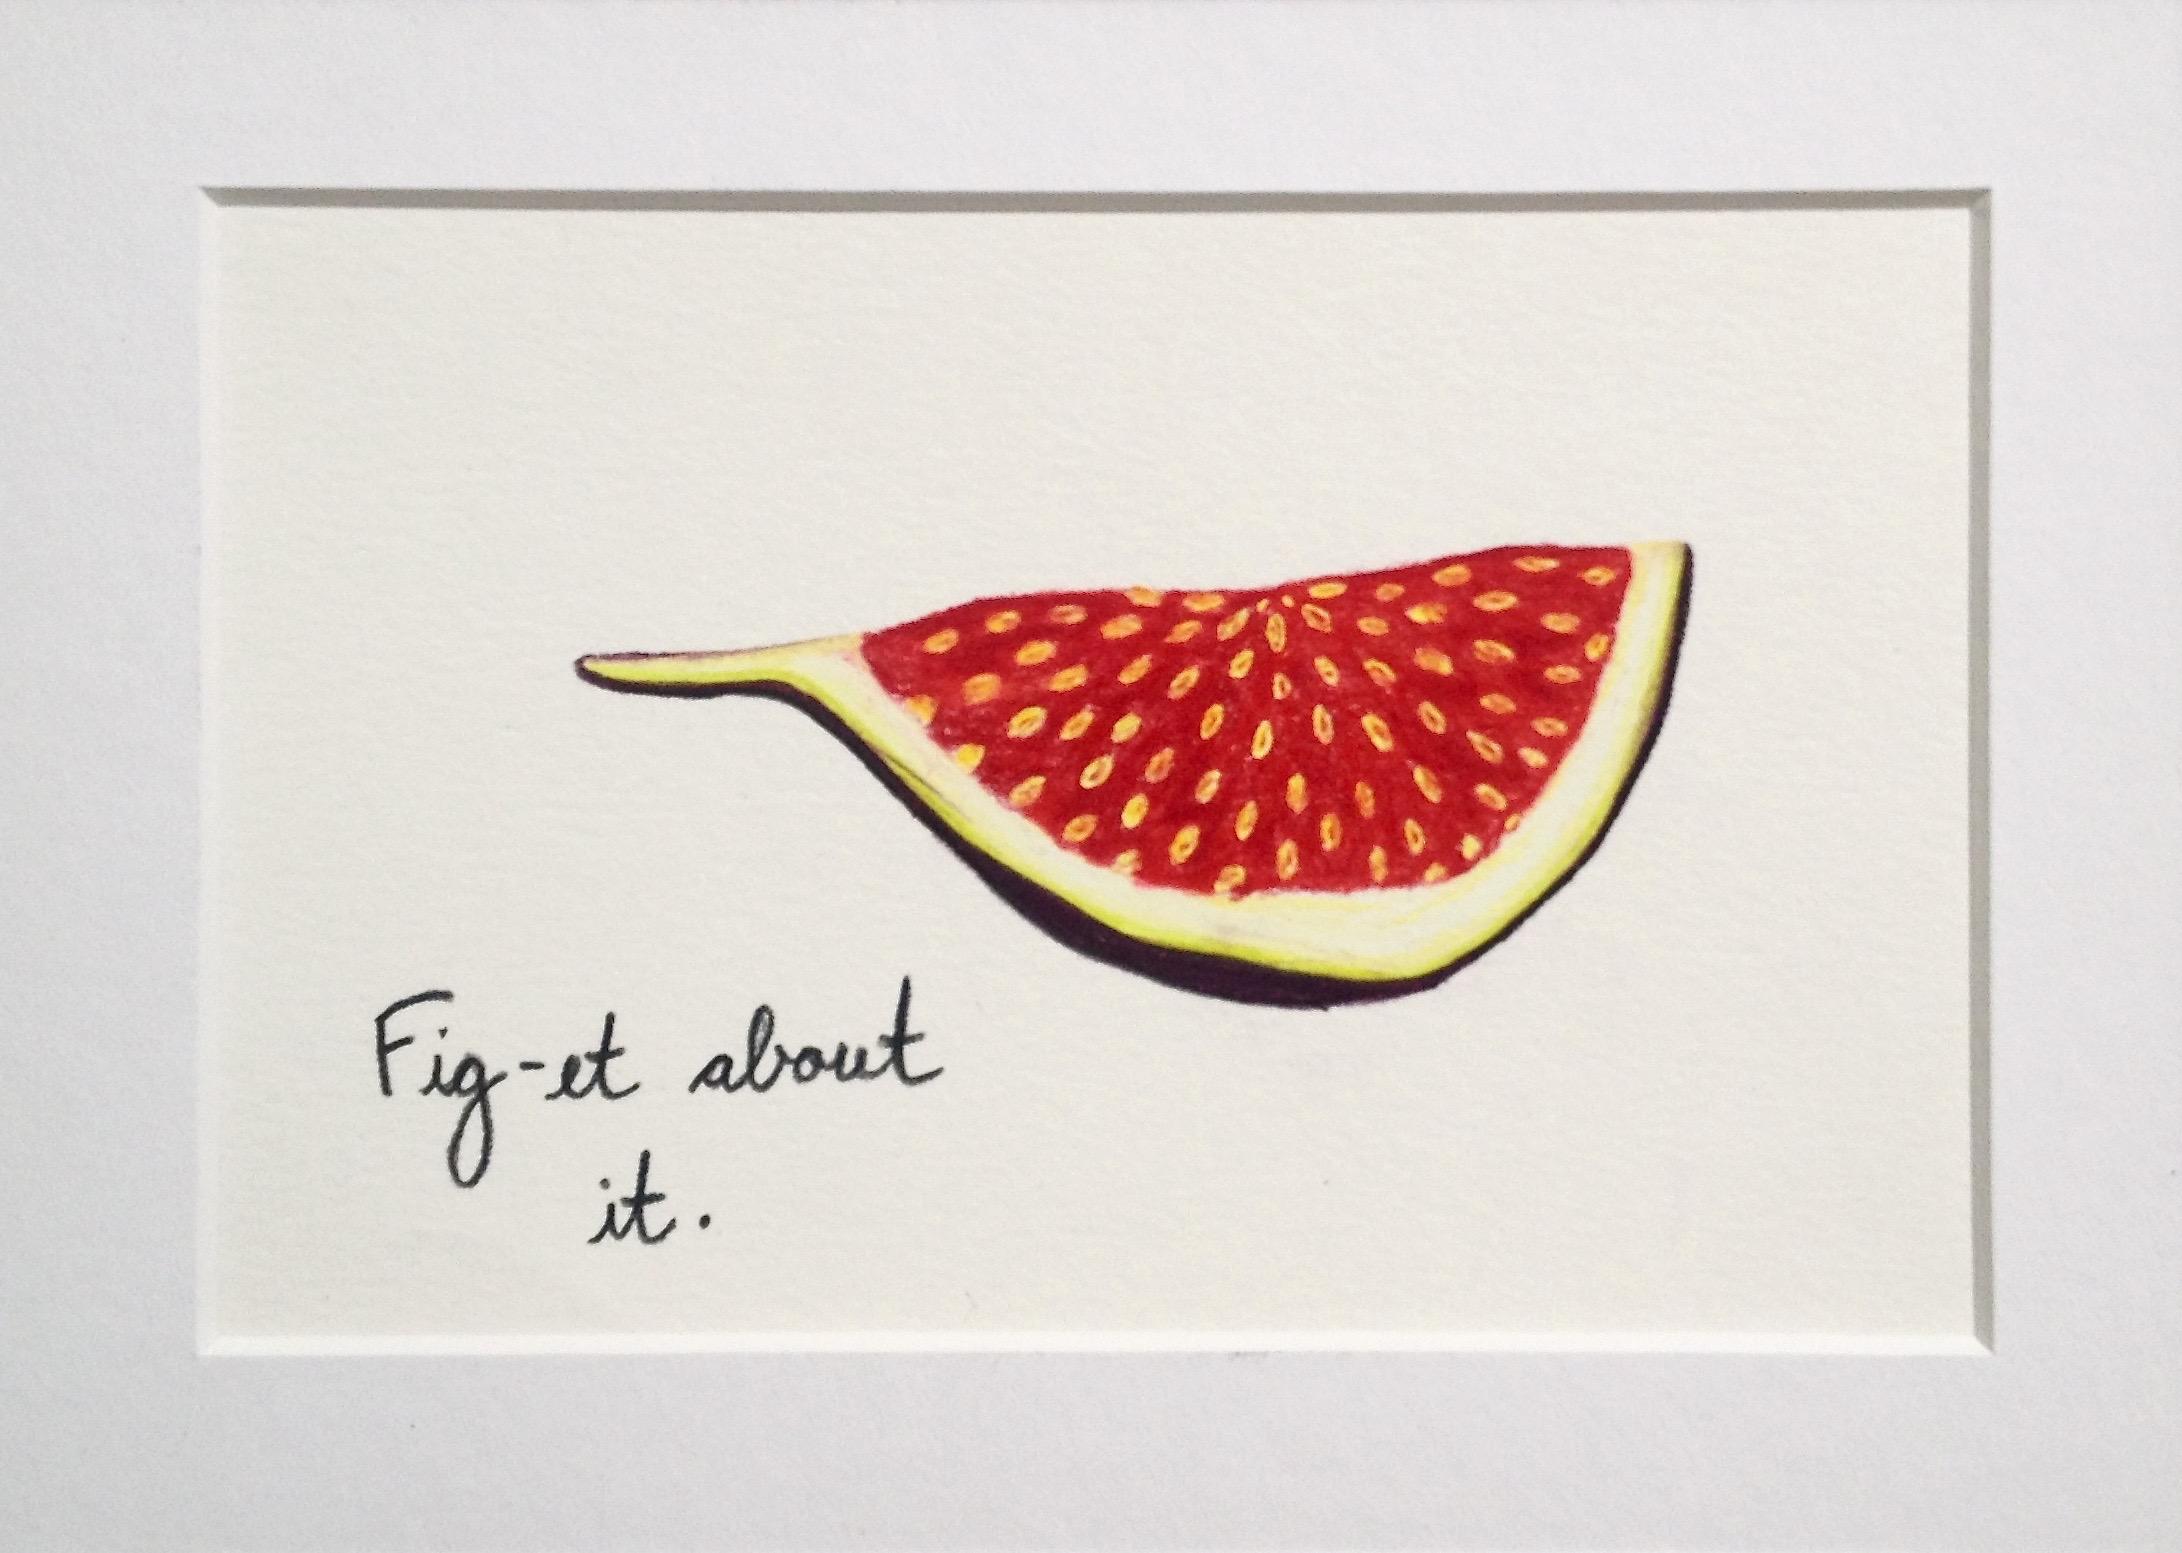 fig-et about it